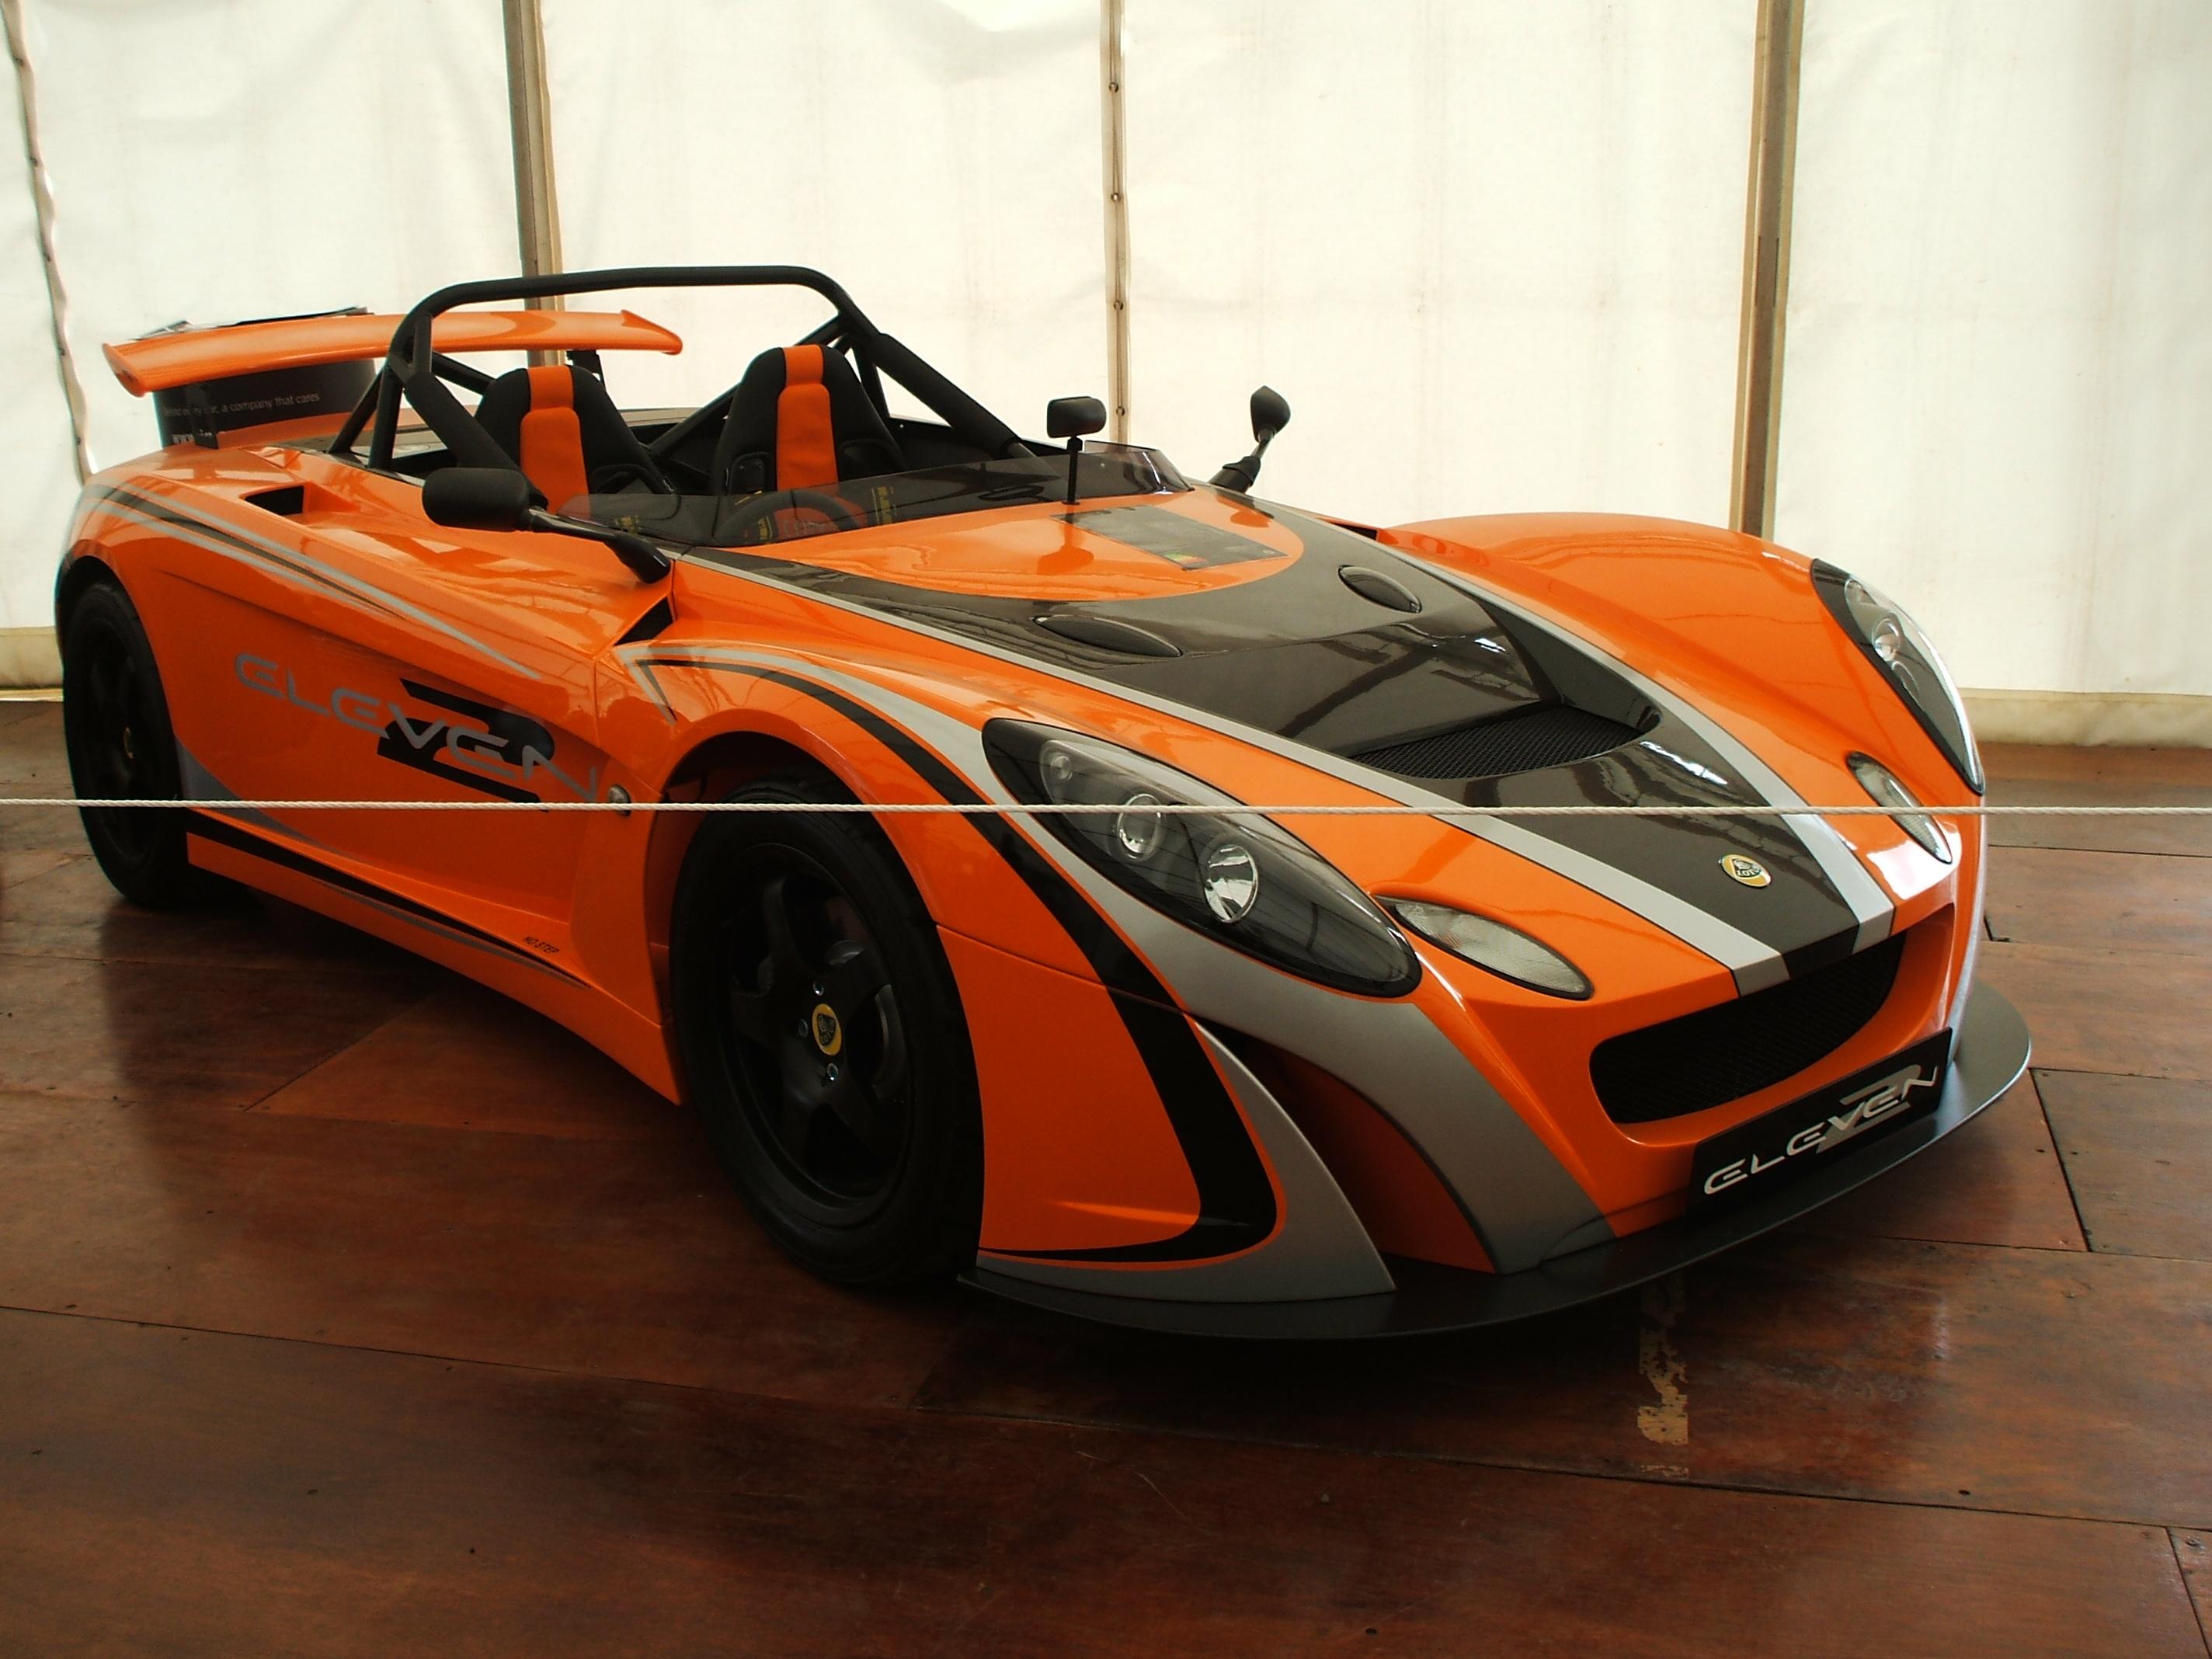 File:Lotus 2-Eleven orange.jpg - Wikimedia Commons